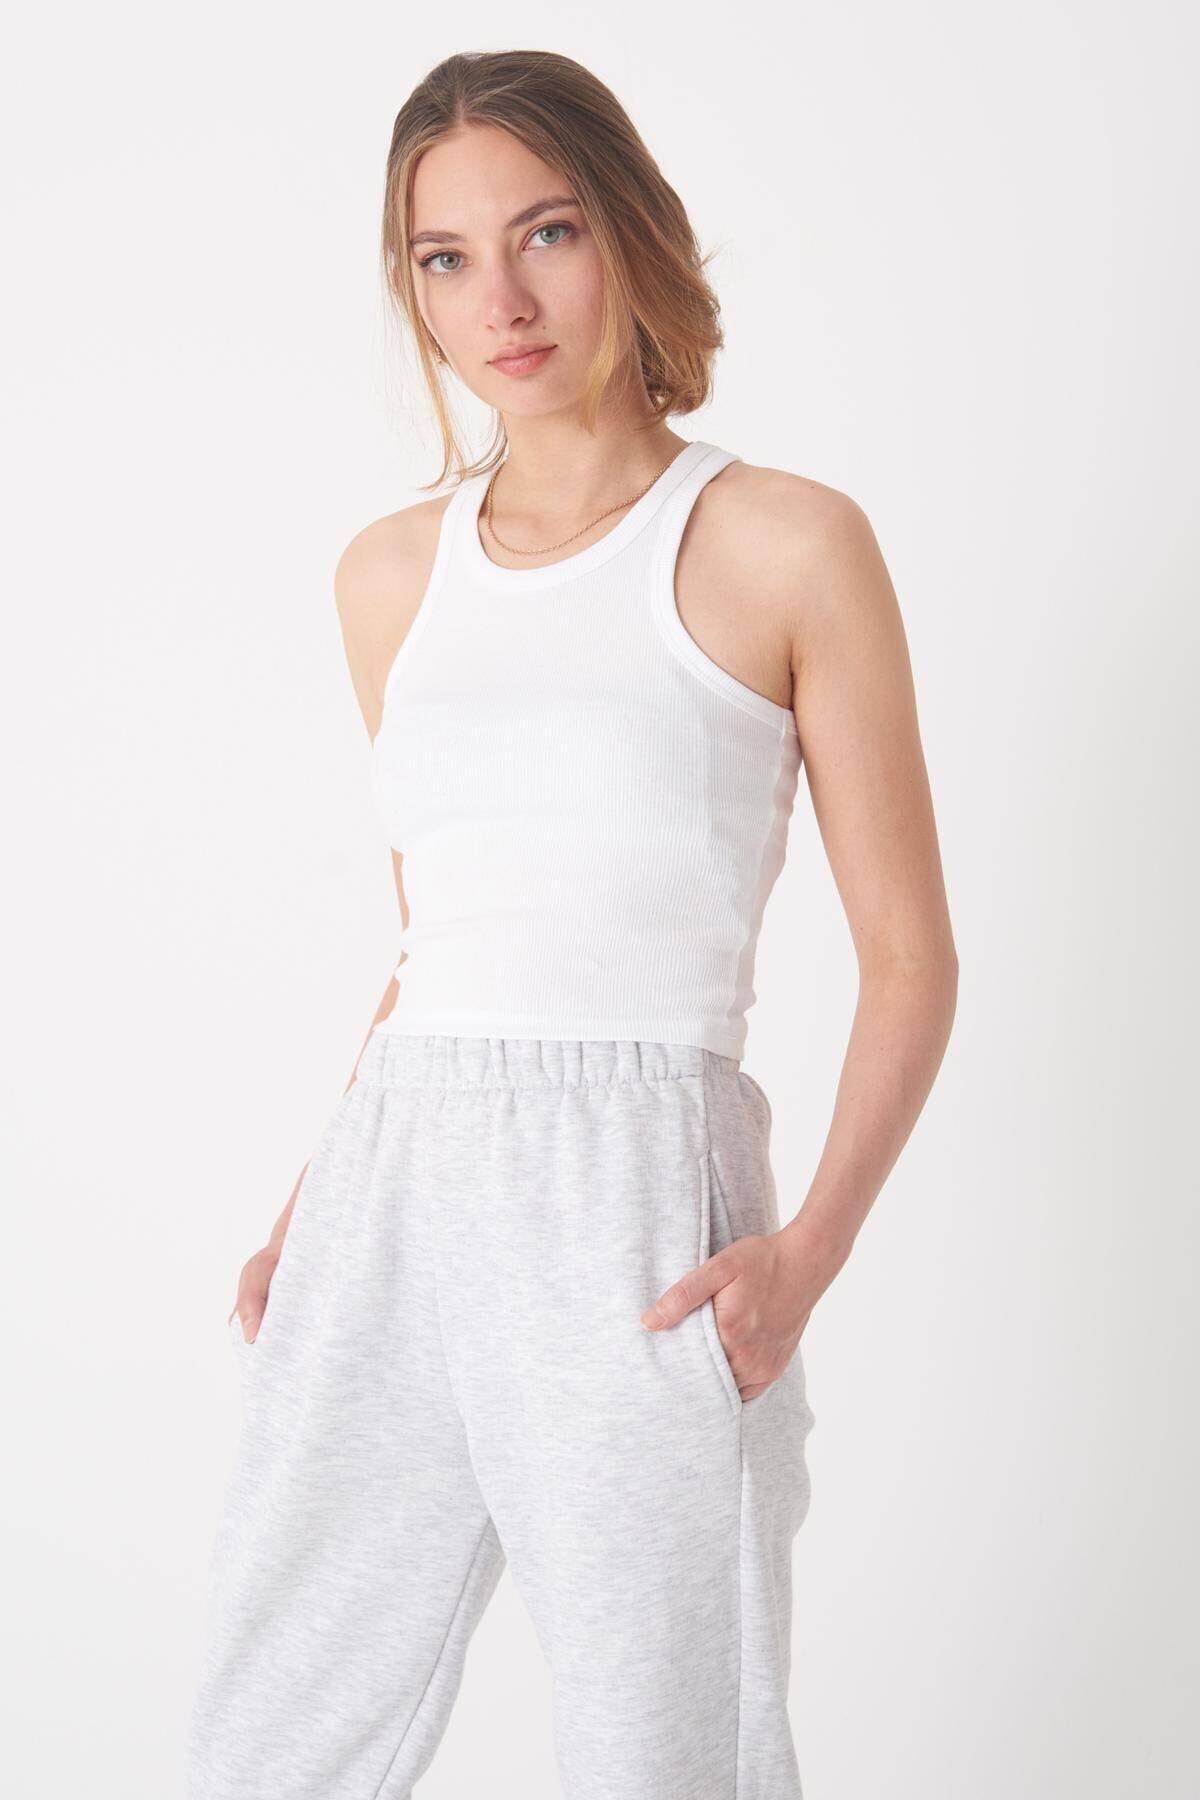 Addax Kadın Beyaz Fitilli Kısa Atlet A0942 - X2 Adx-0000022303 4